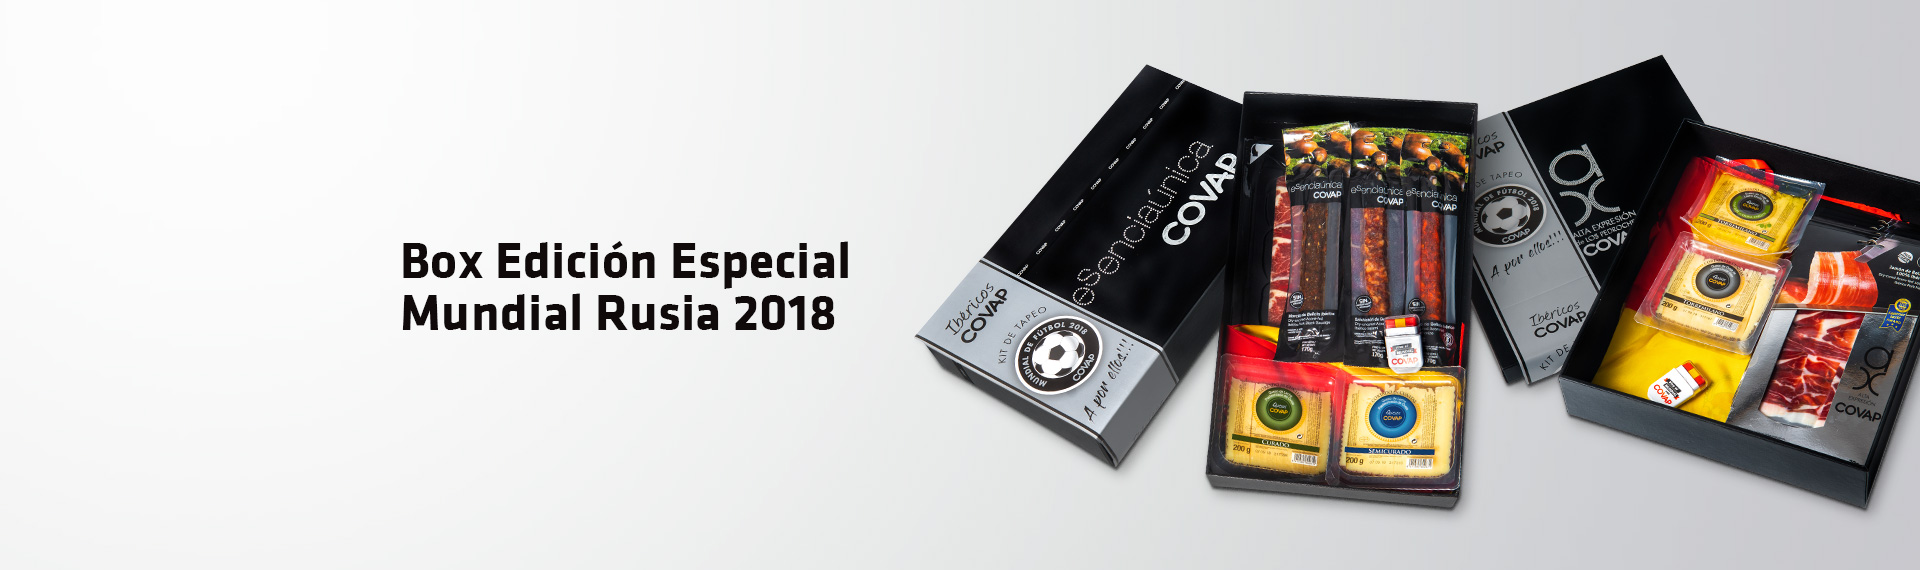 Box Picoteo Mundial Rusia 2018 | Ibéricos COVAP